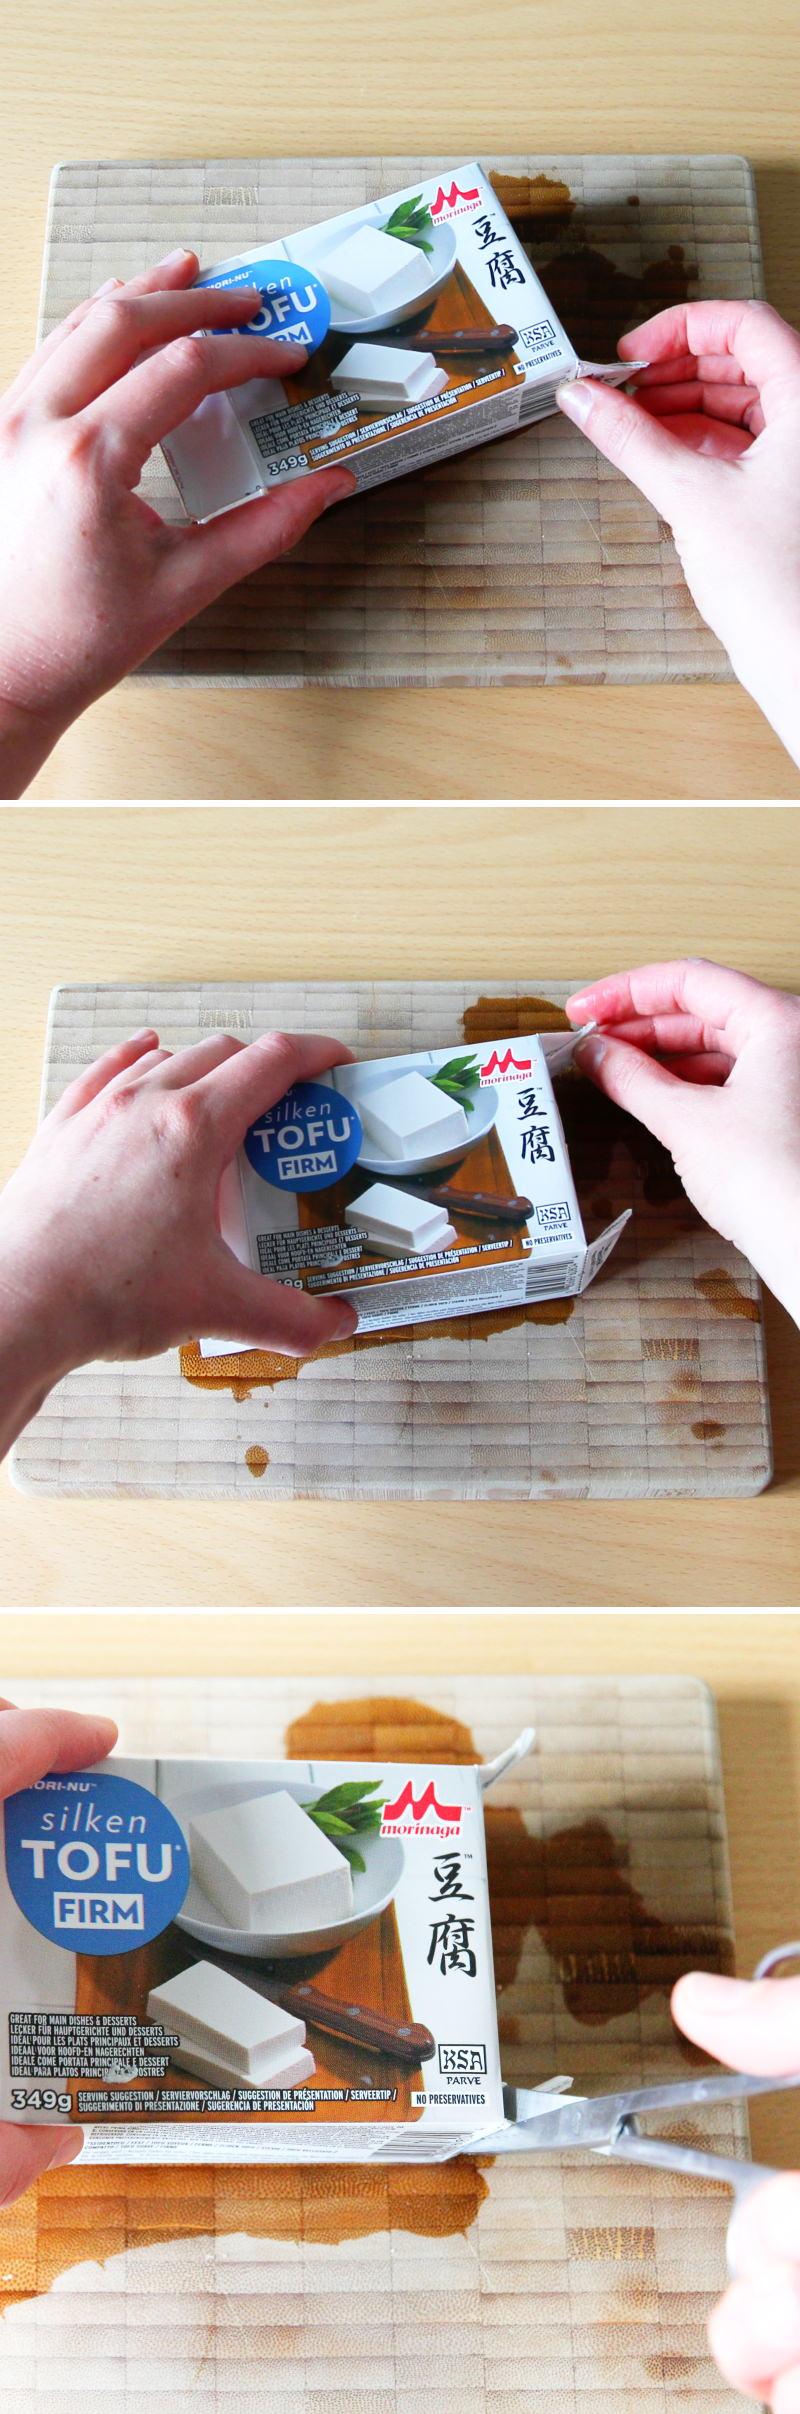 Tofu Verpackung öffnen Schritt 3